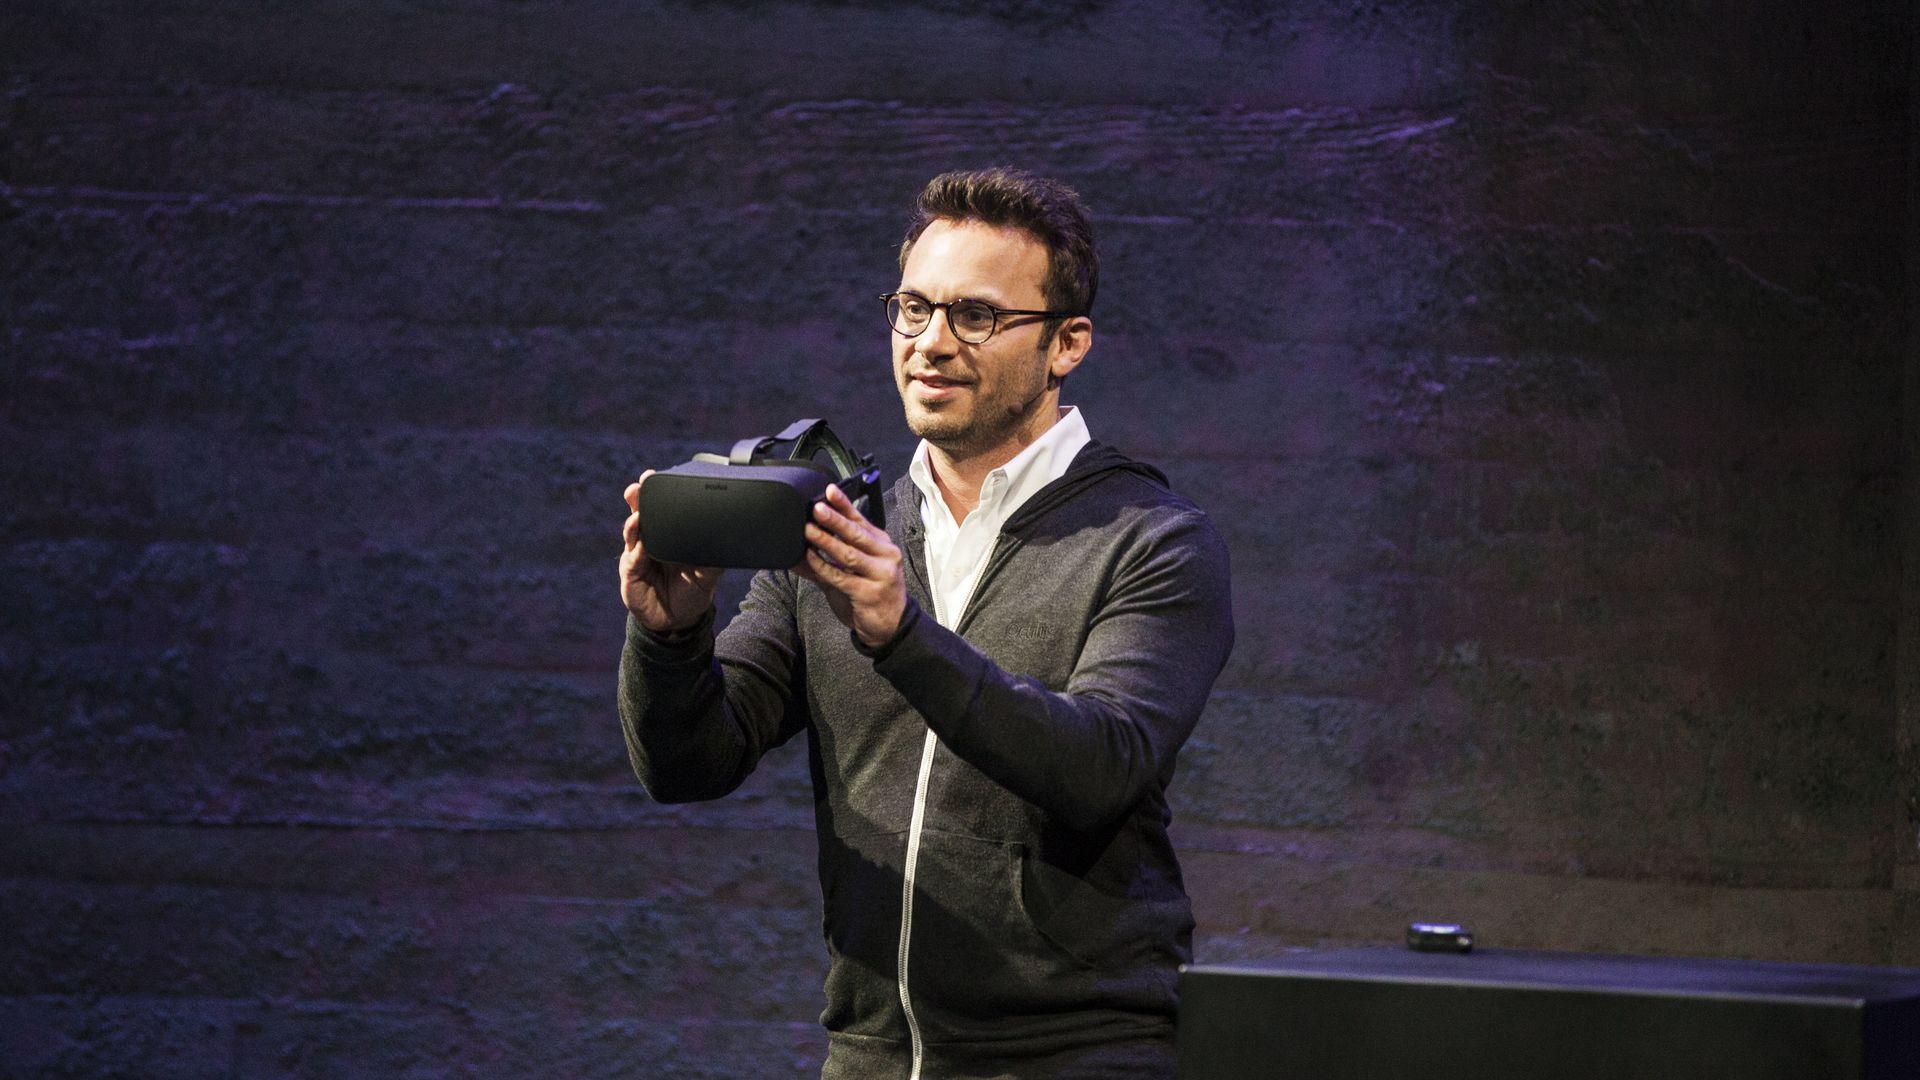 Photo of Oculus co-founder Brendan Iribe holding a virtual reality headset.